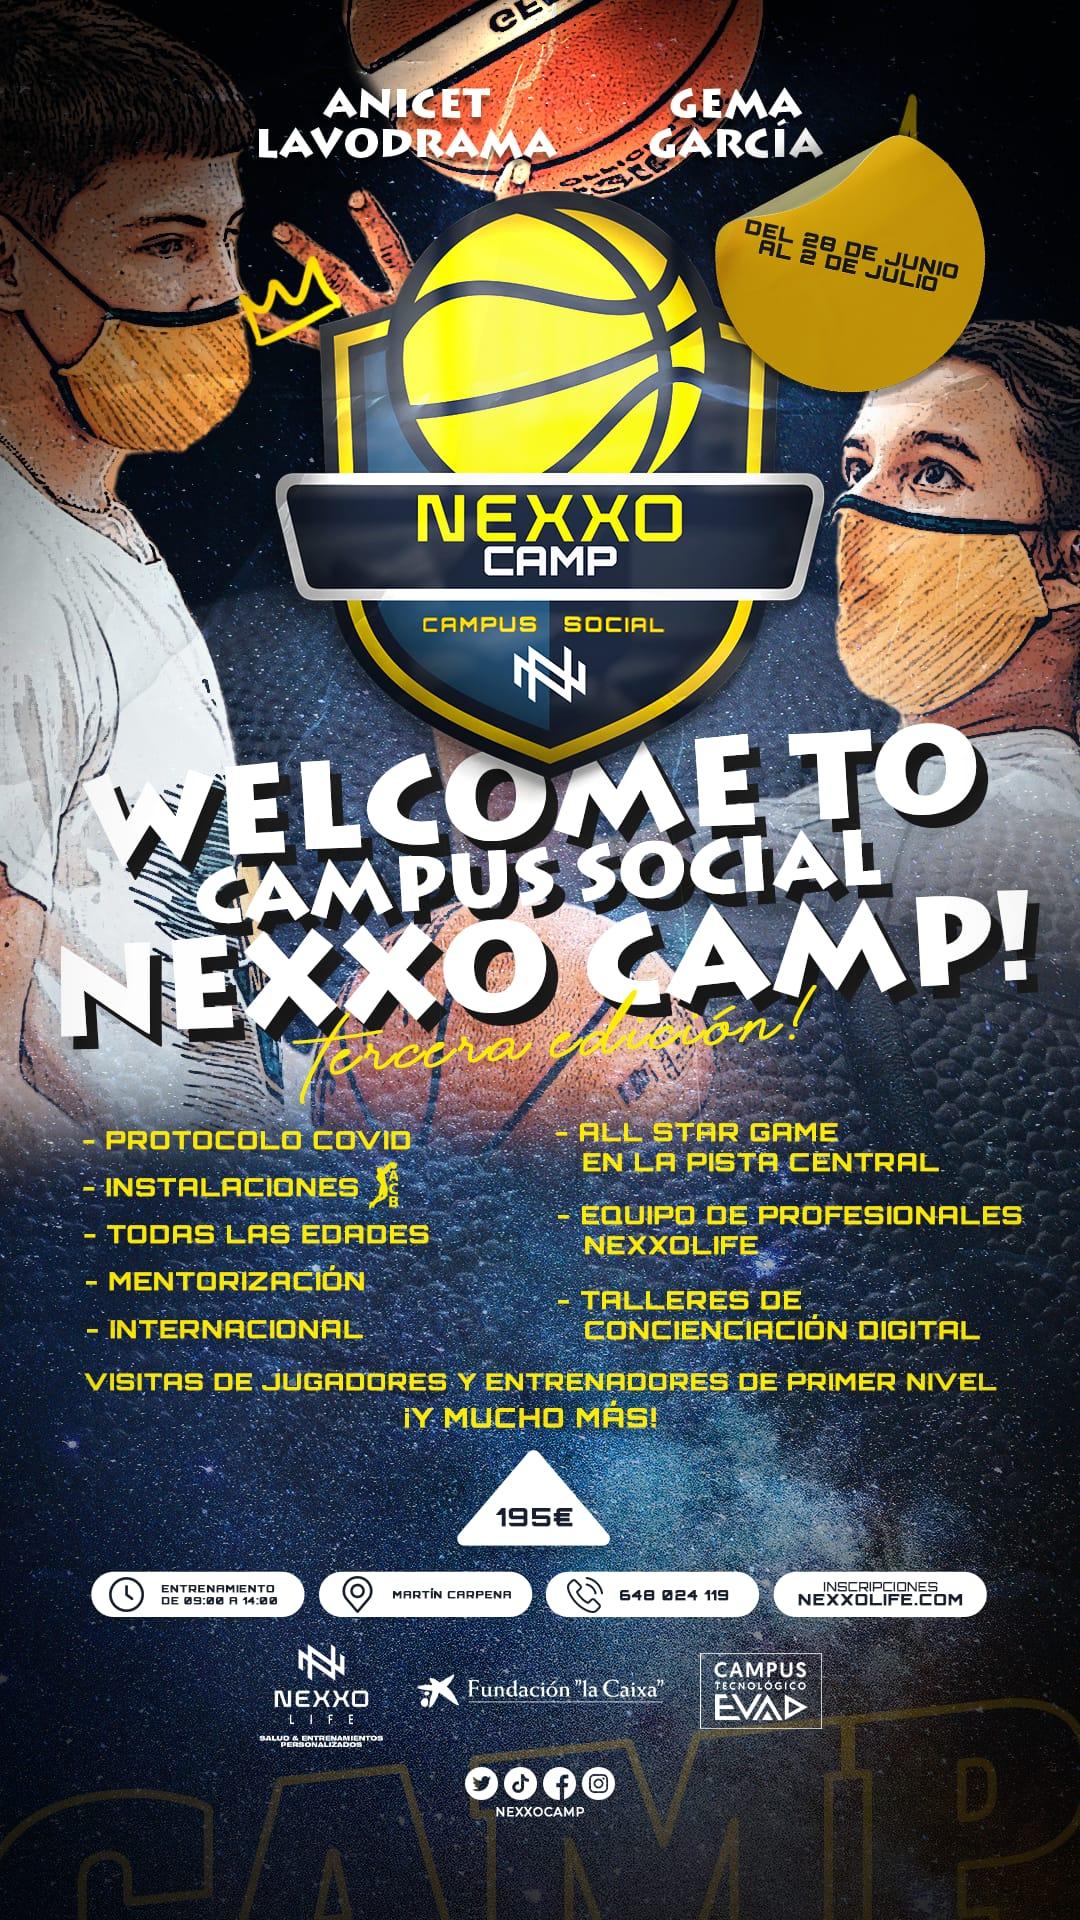 Nexxo Camp